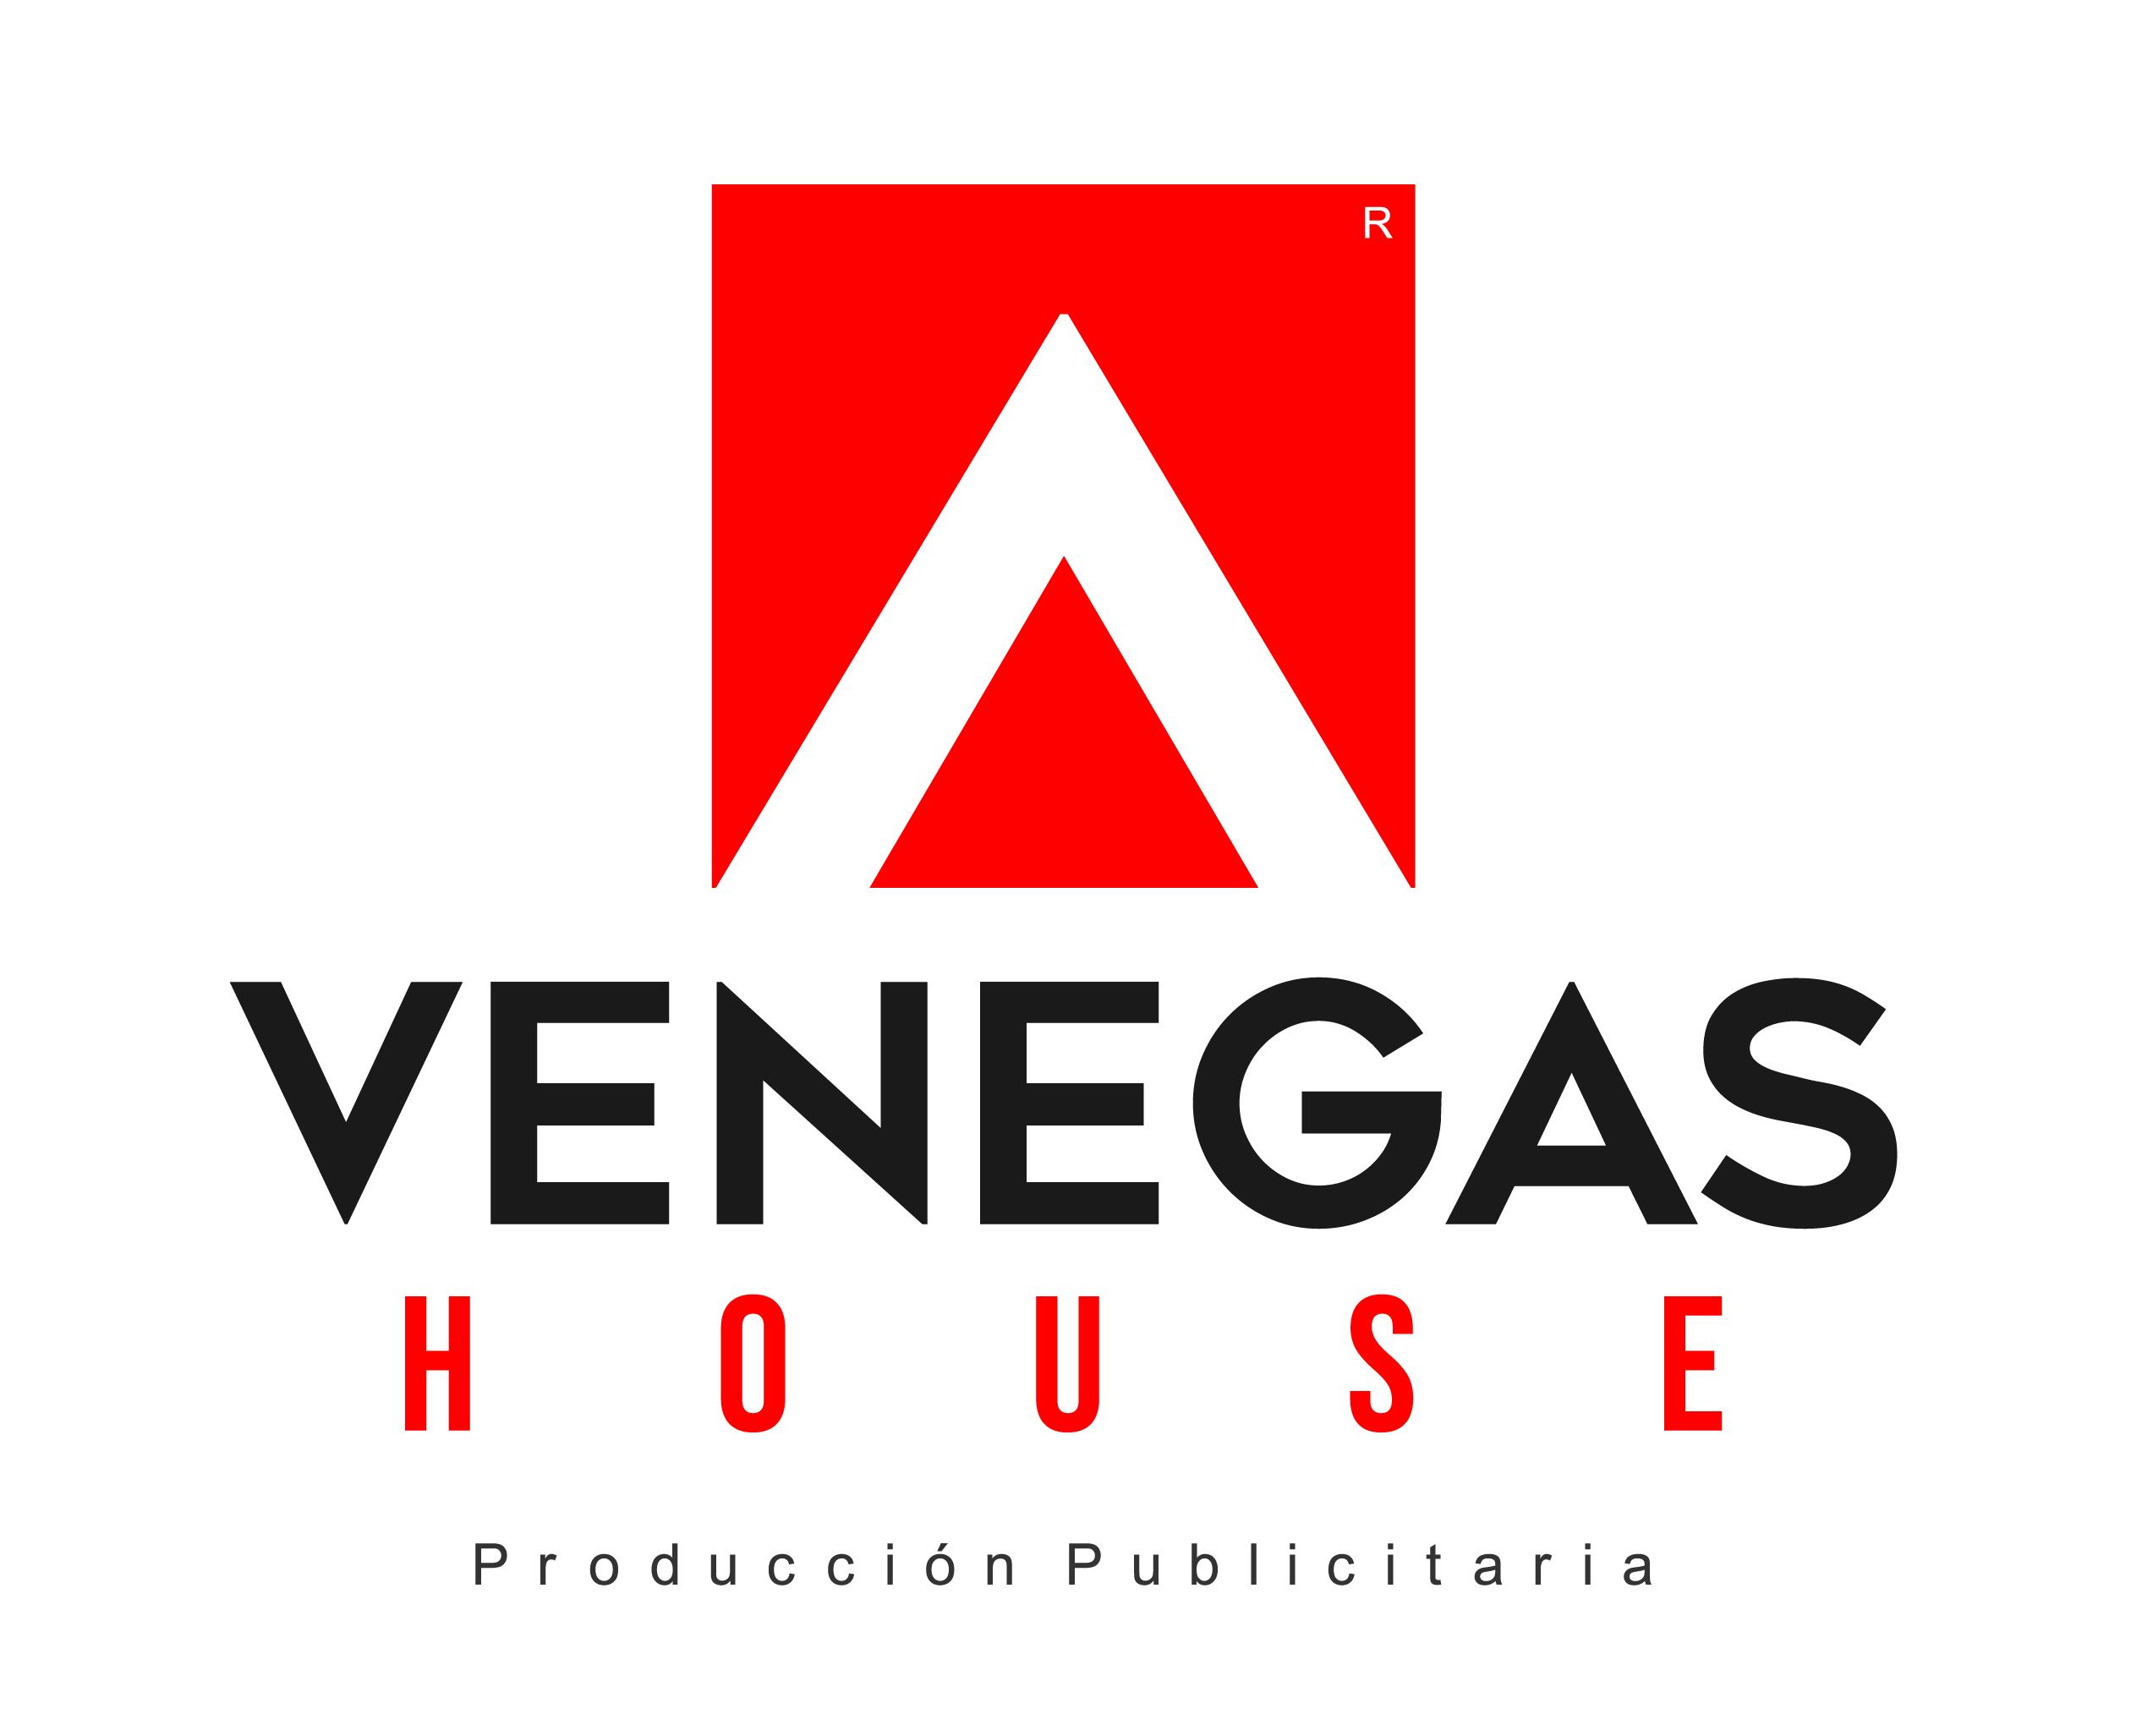 LOGOTIPO VENEGAS HOUSE